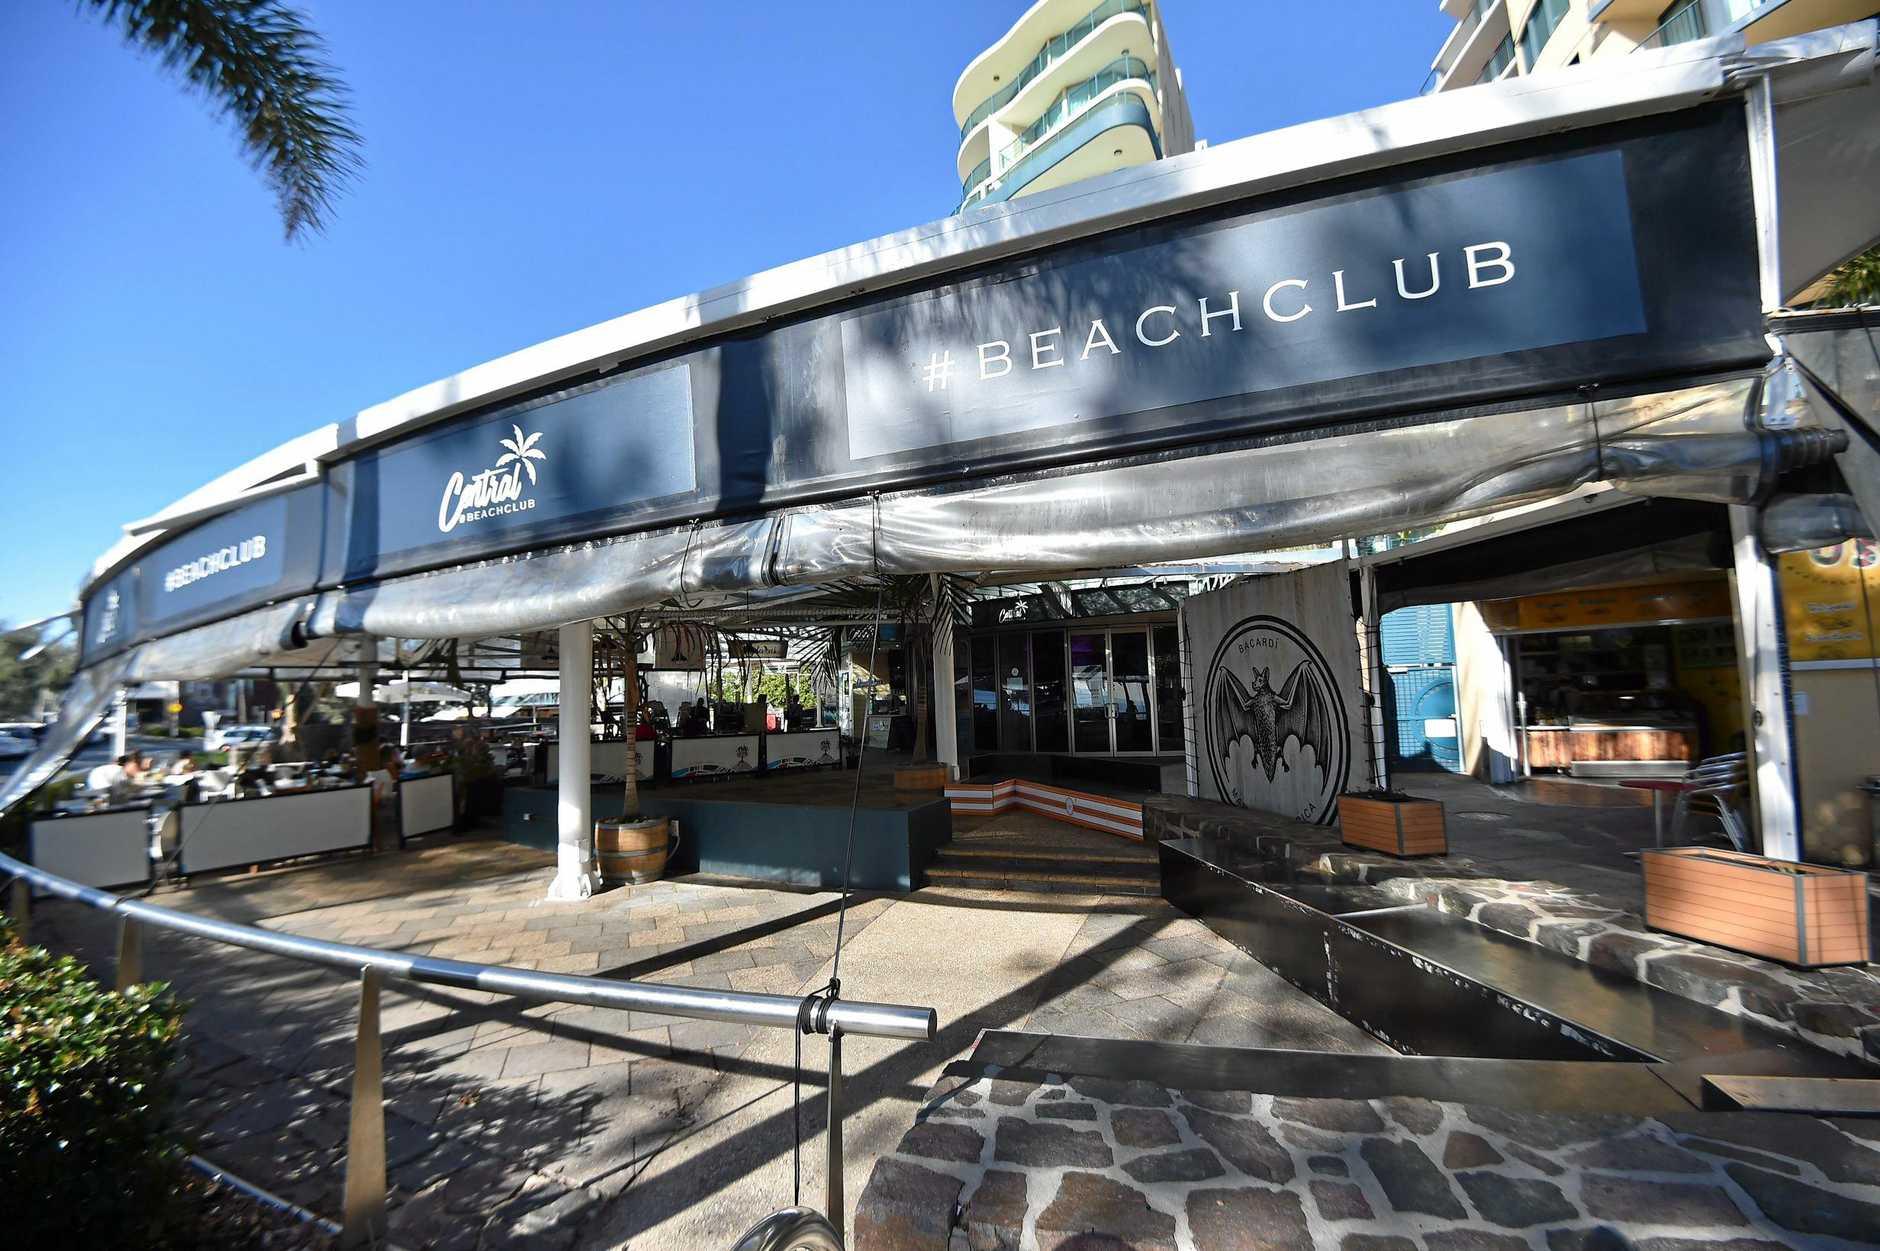 Central Beach Club Mooloolaba and Hashtag #Phresh on Mooloolaba Esplanade closed.